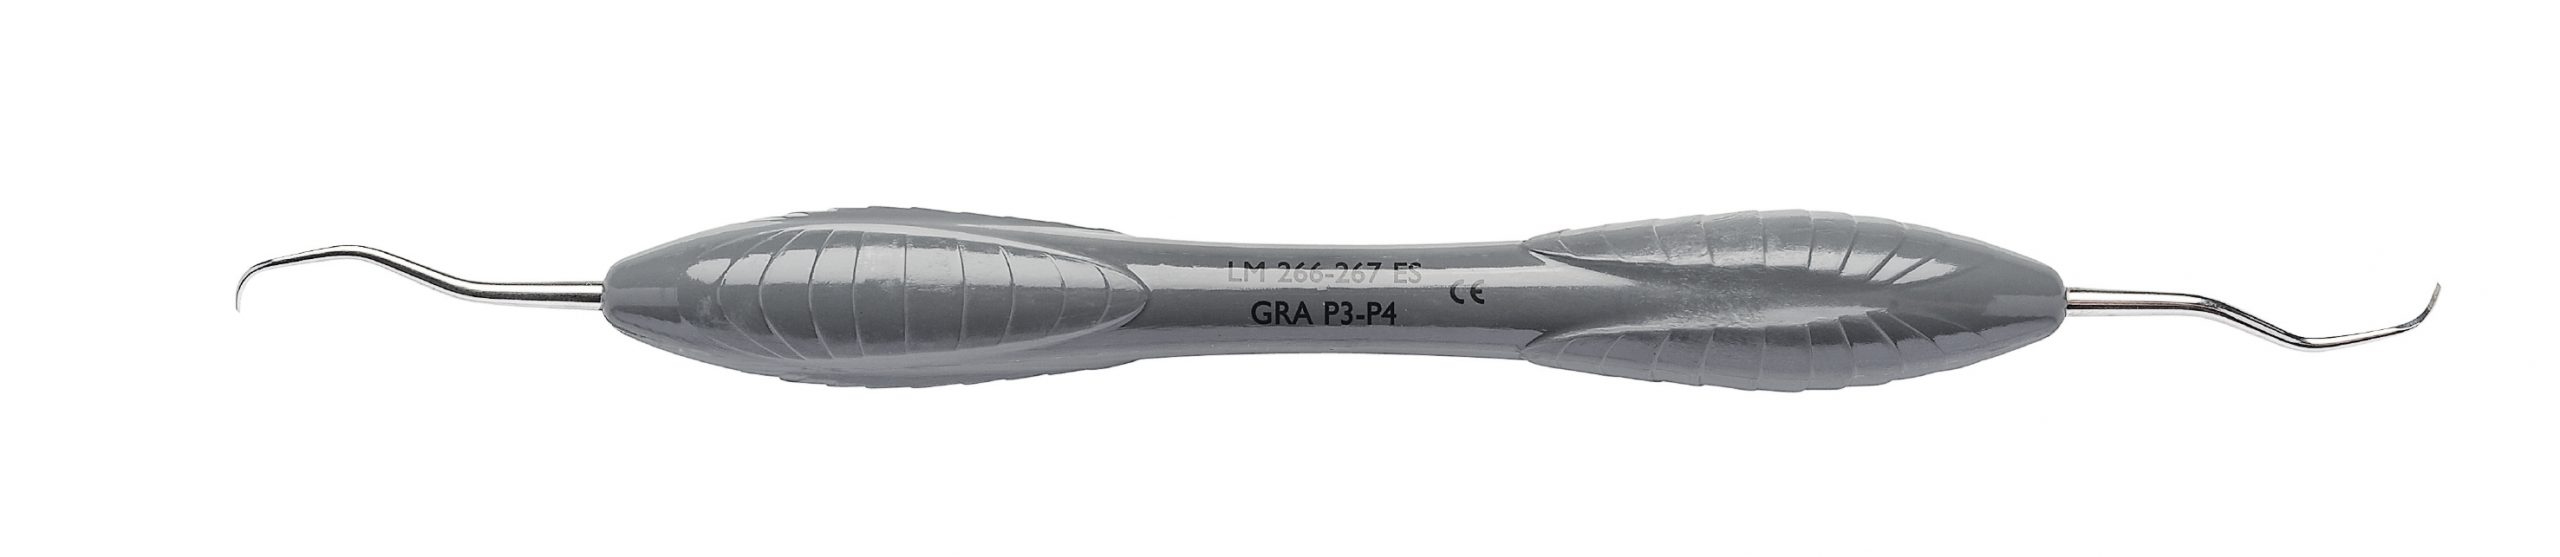 GRA P3-P4 LM 266-267 ES-1